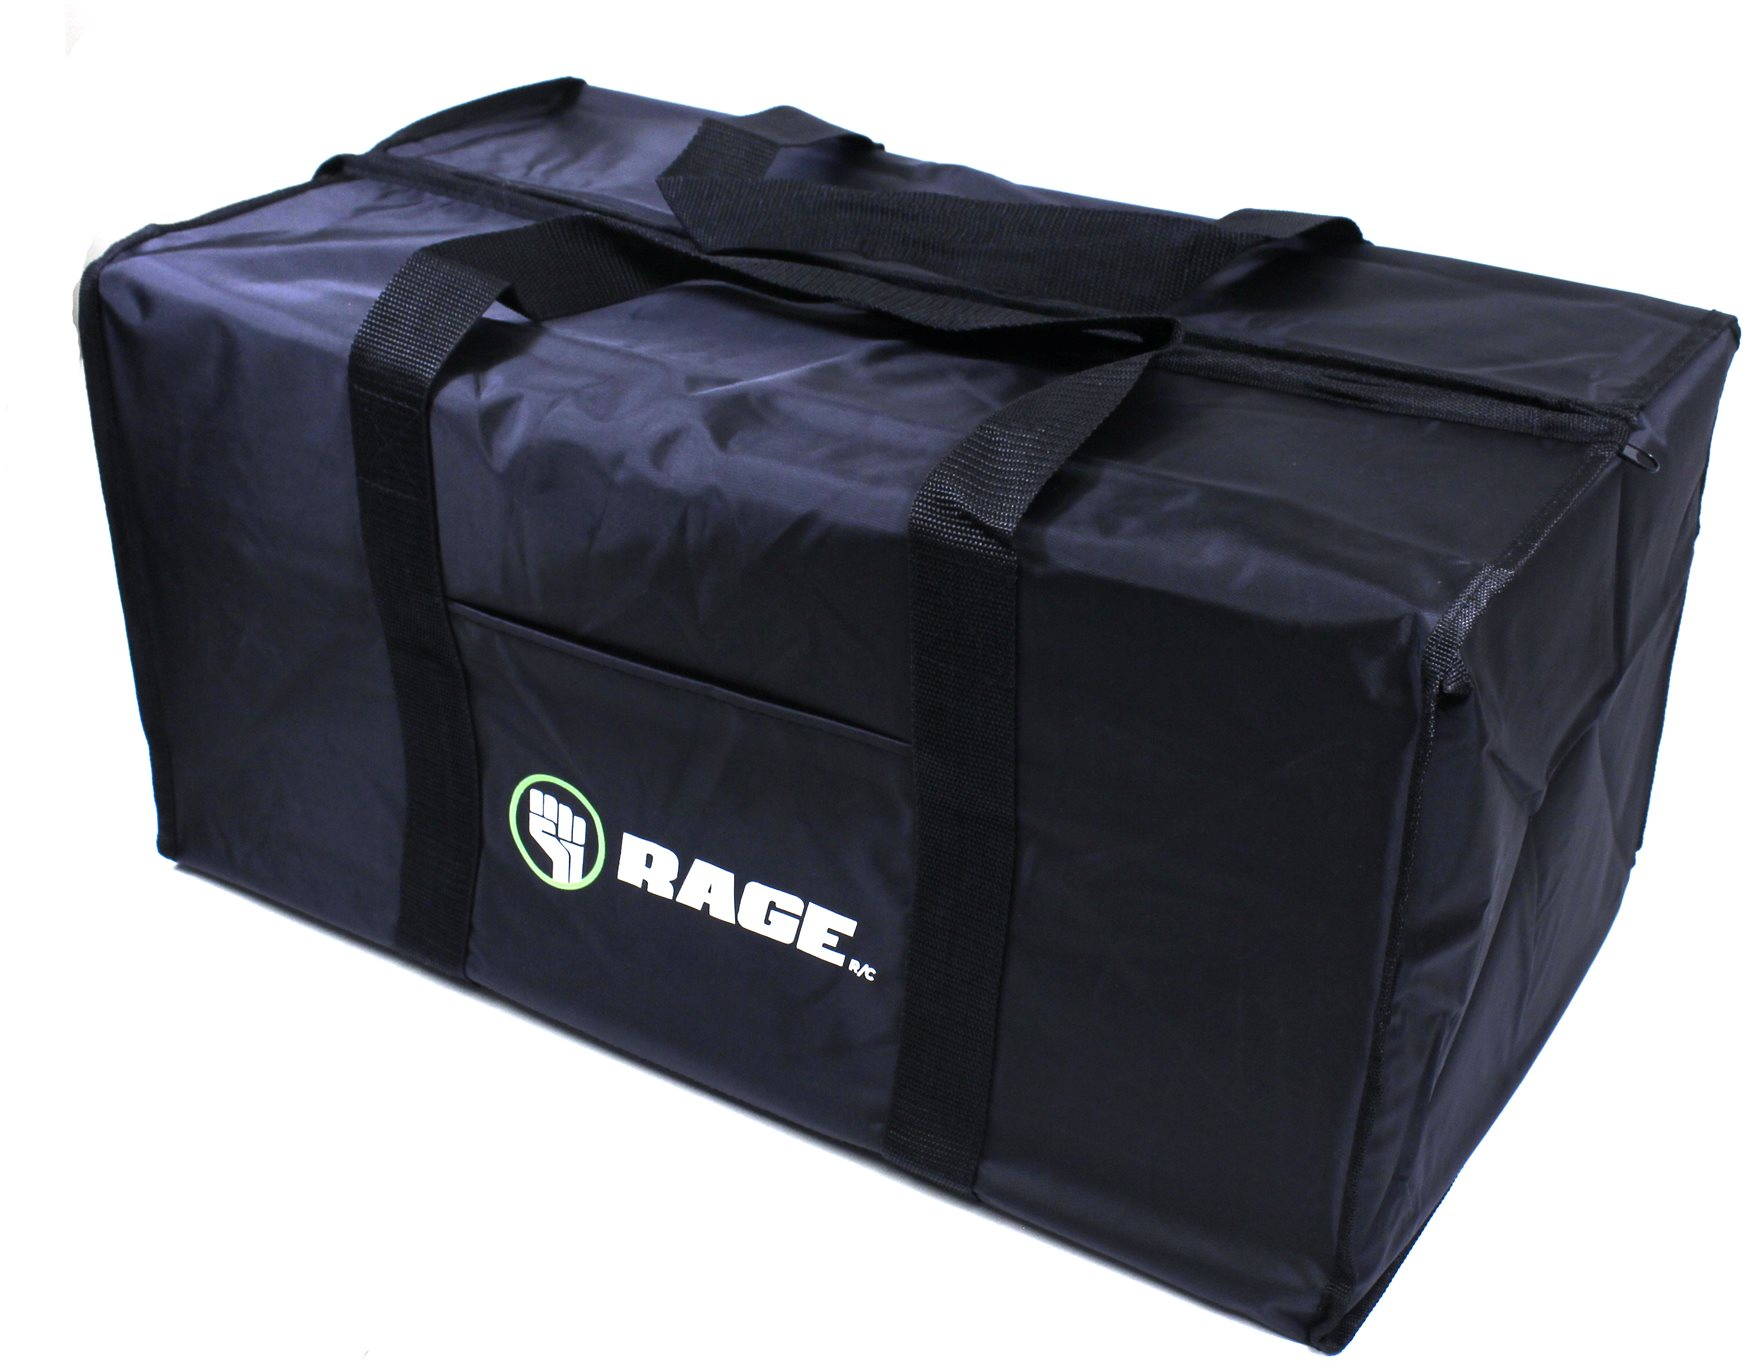 Rage RC Large Gear Bag, Black